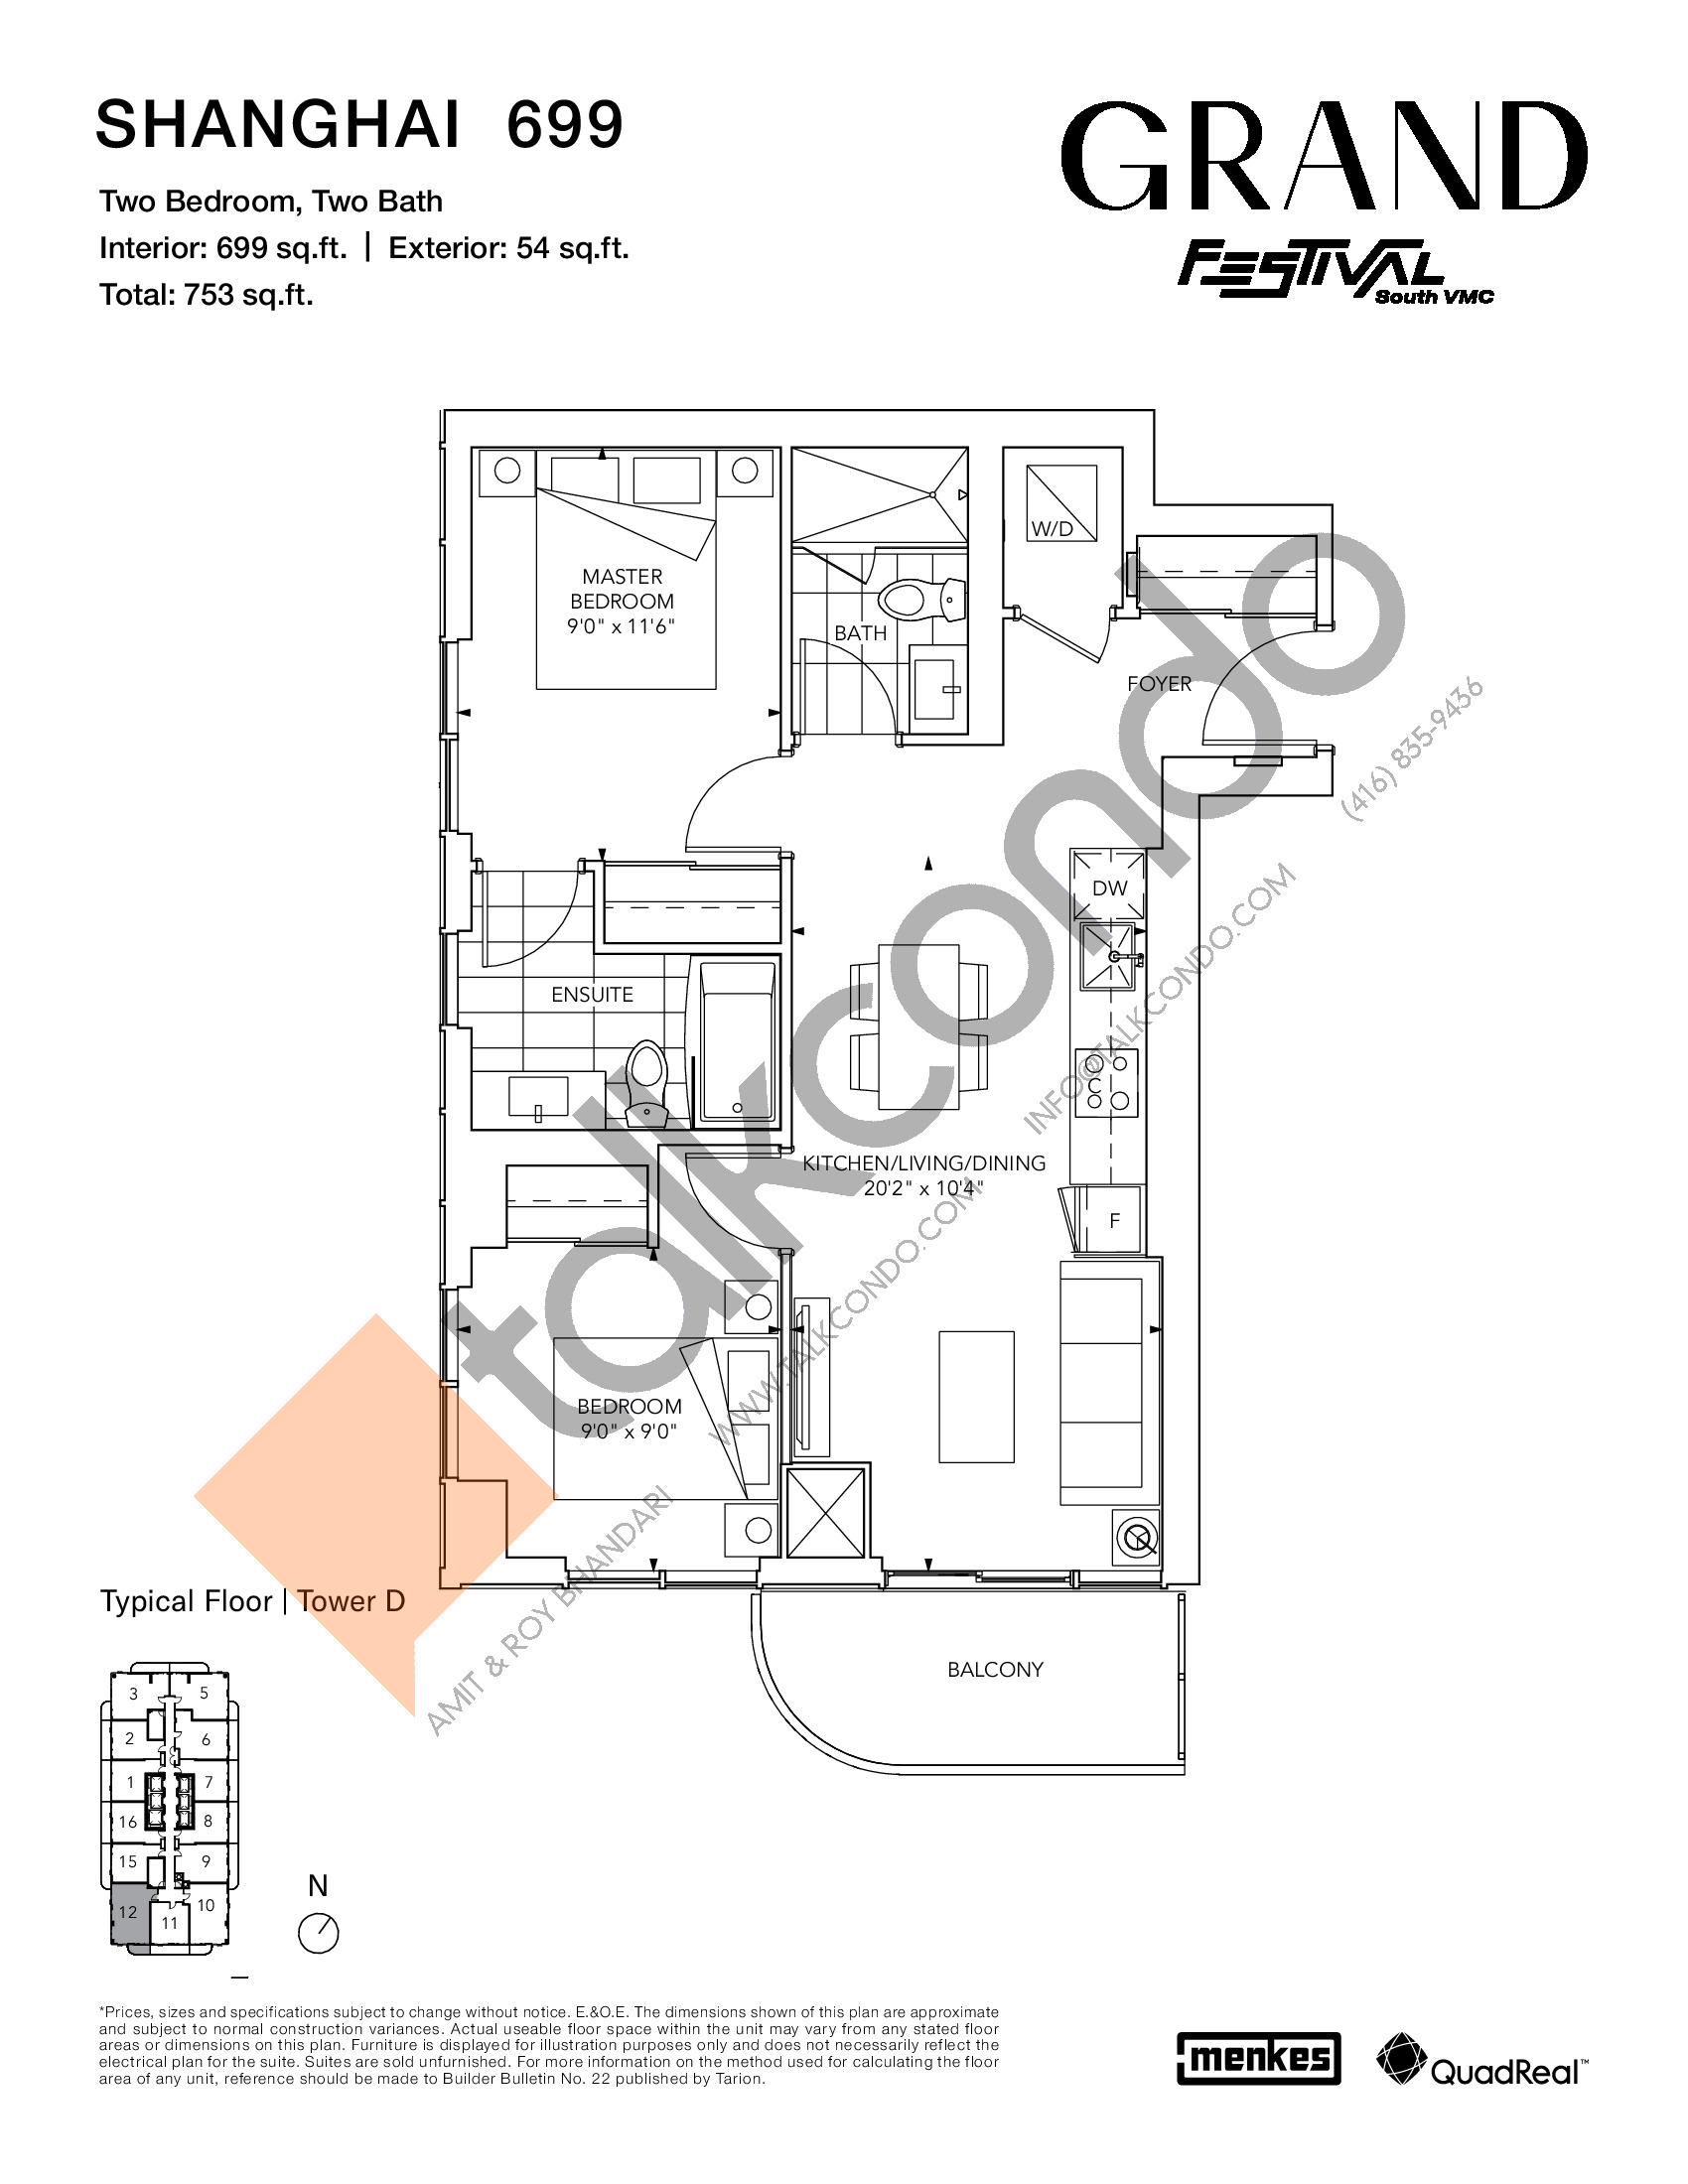 Shanghai 699 Floor Plan at Grand Festival Condos - 699 sq.ft